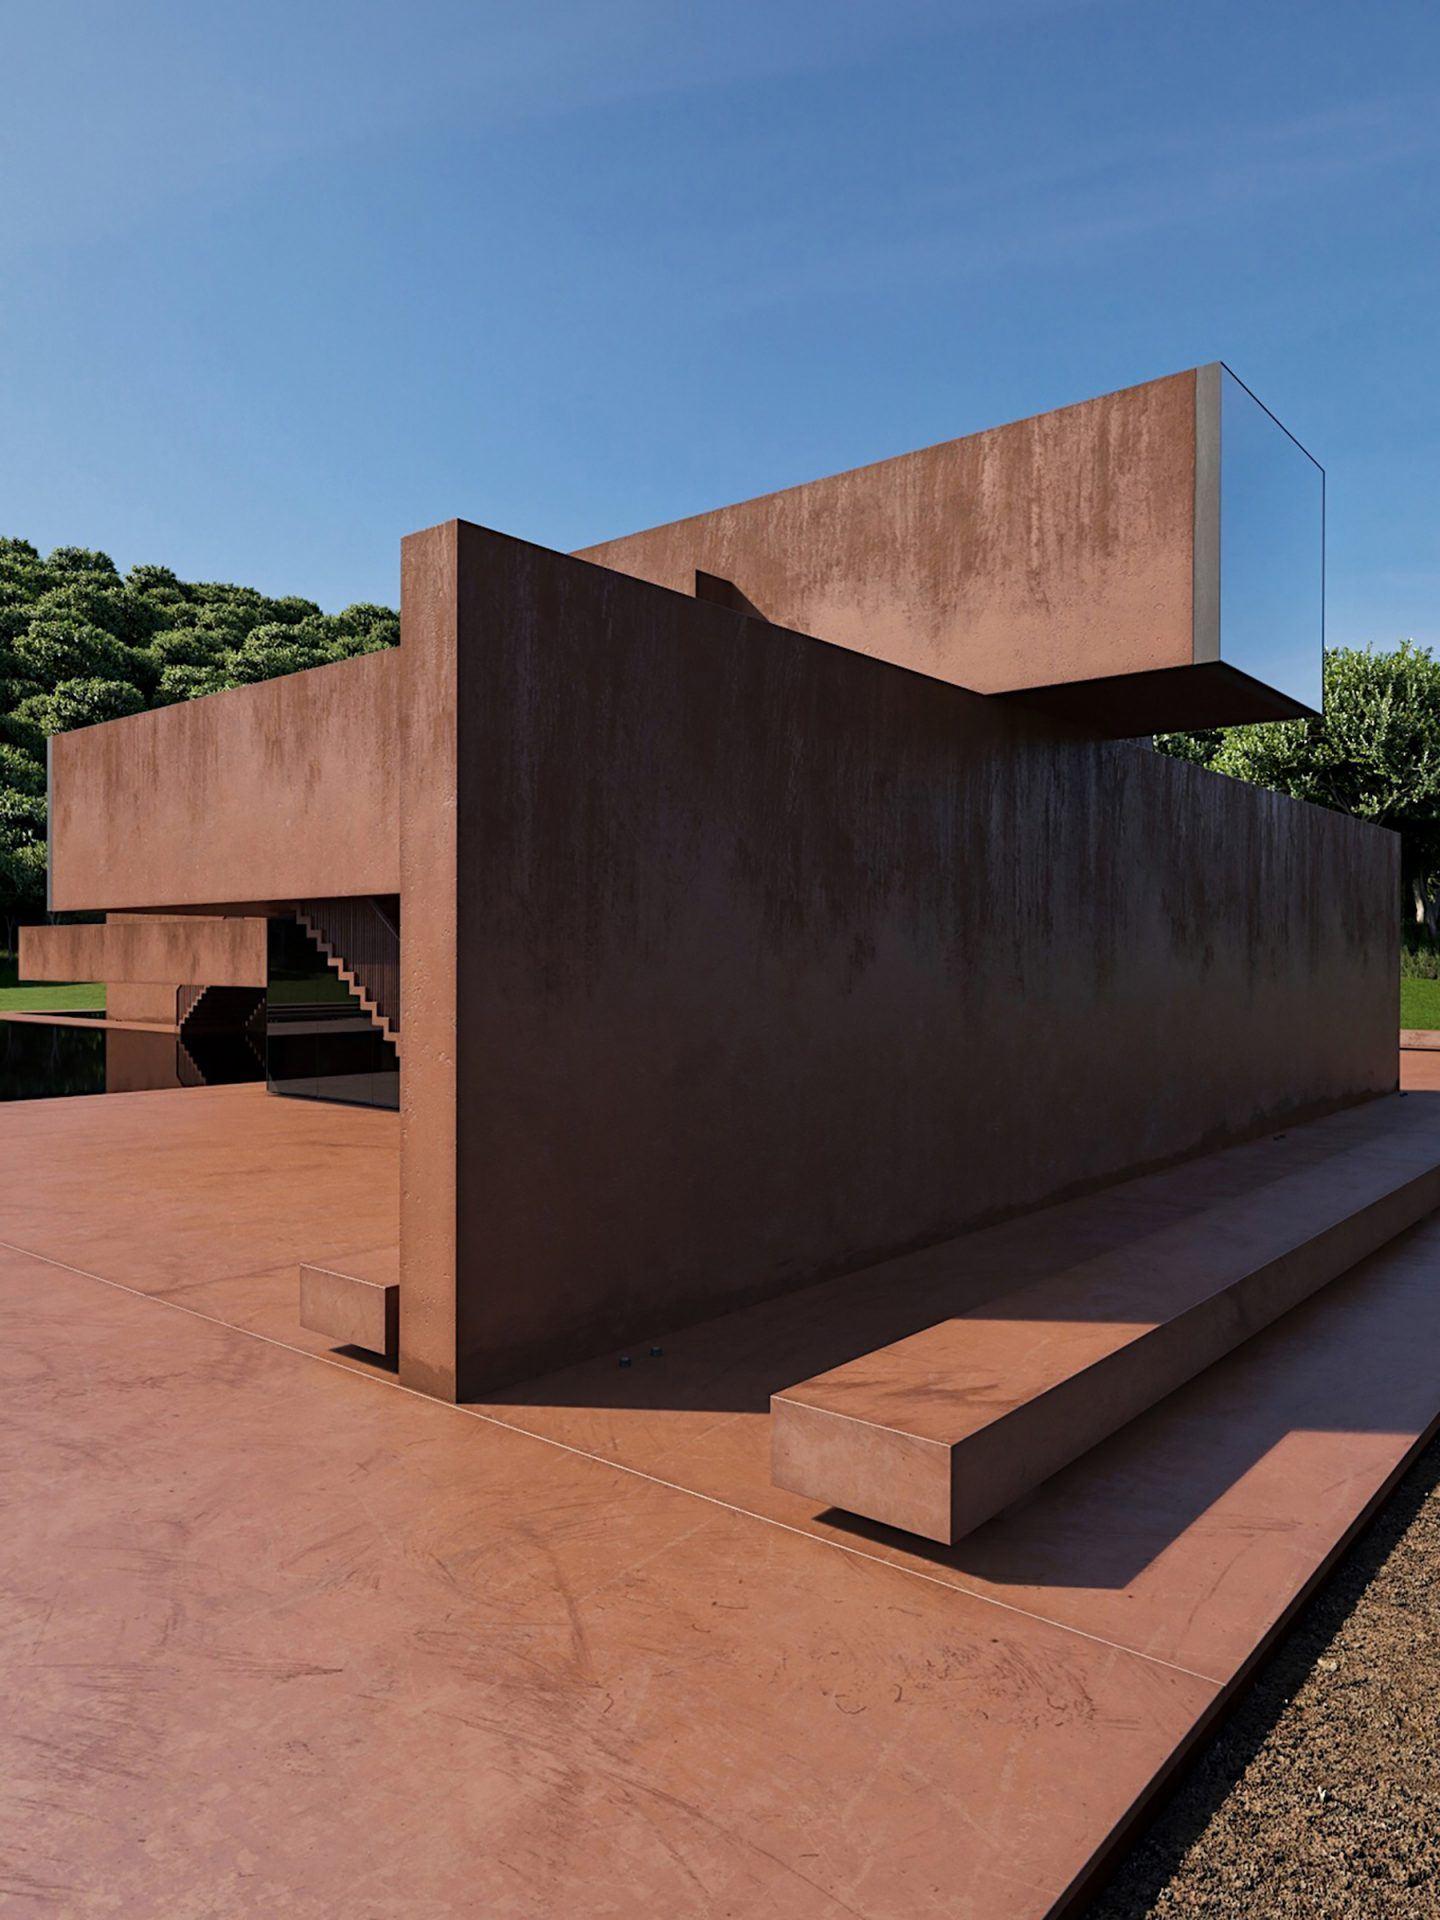 IGNANT-Architecture-SPRW-Architects-Flatness-08